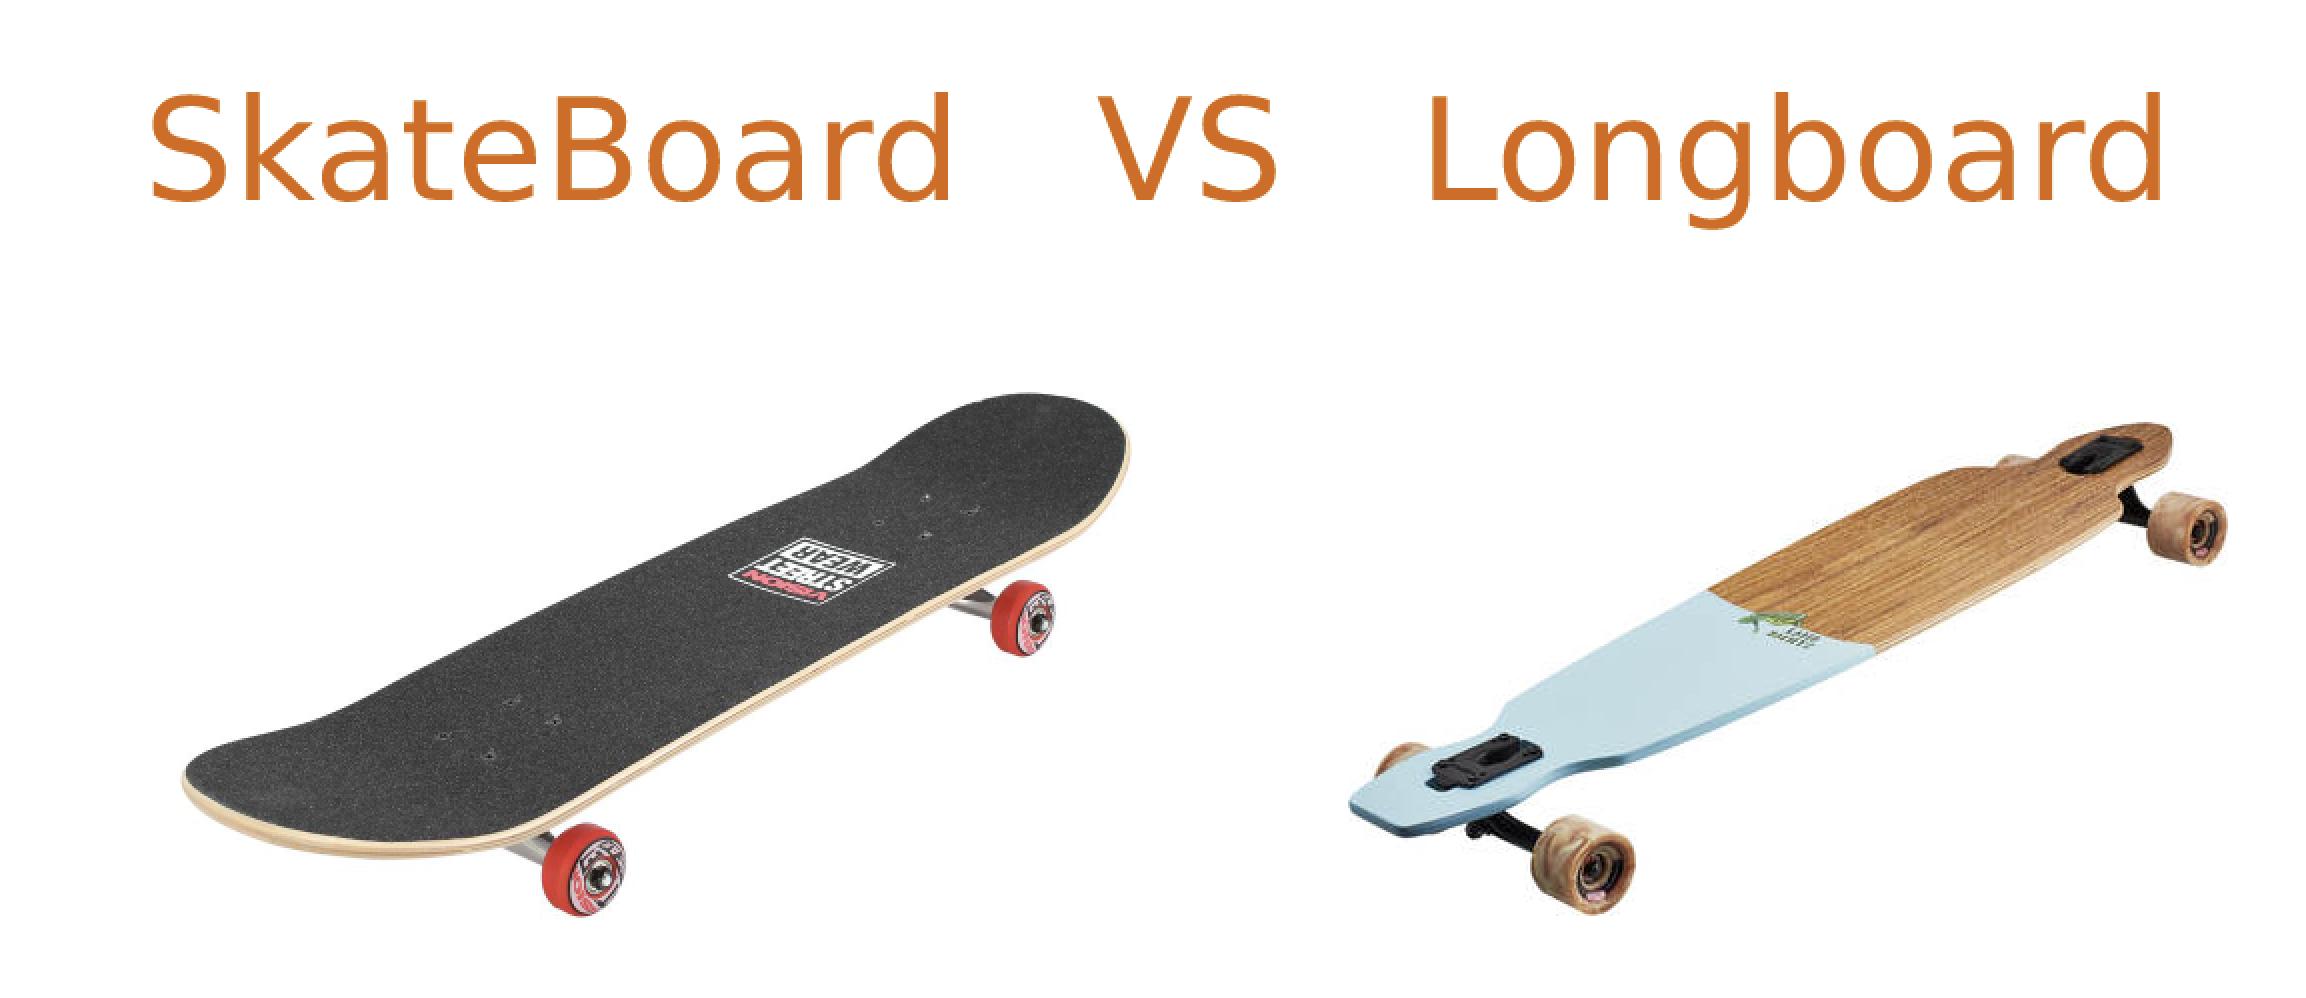 Longboard Vs Skateboard.png 2019-11-09 10-41-28